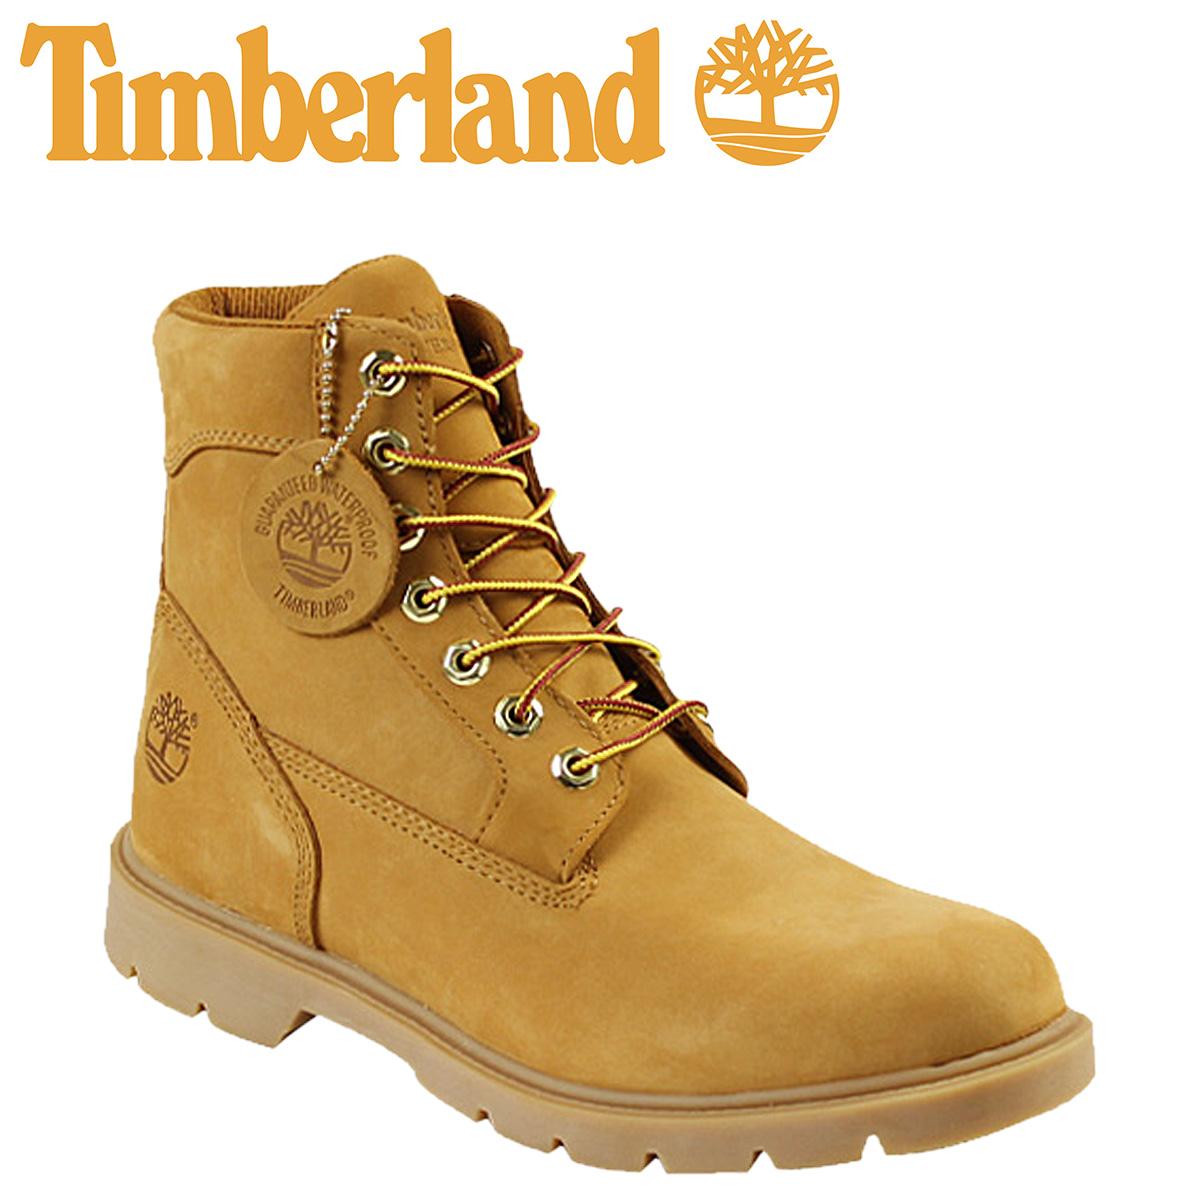 Menns 6 Tommers Timberland Støvler YFb3A